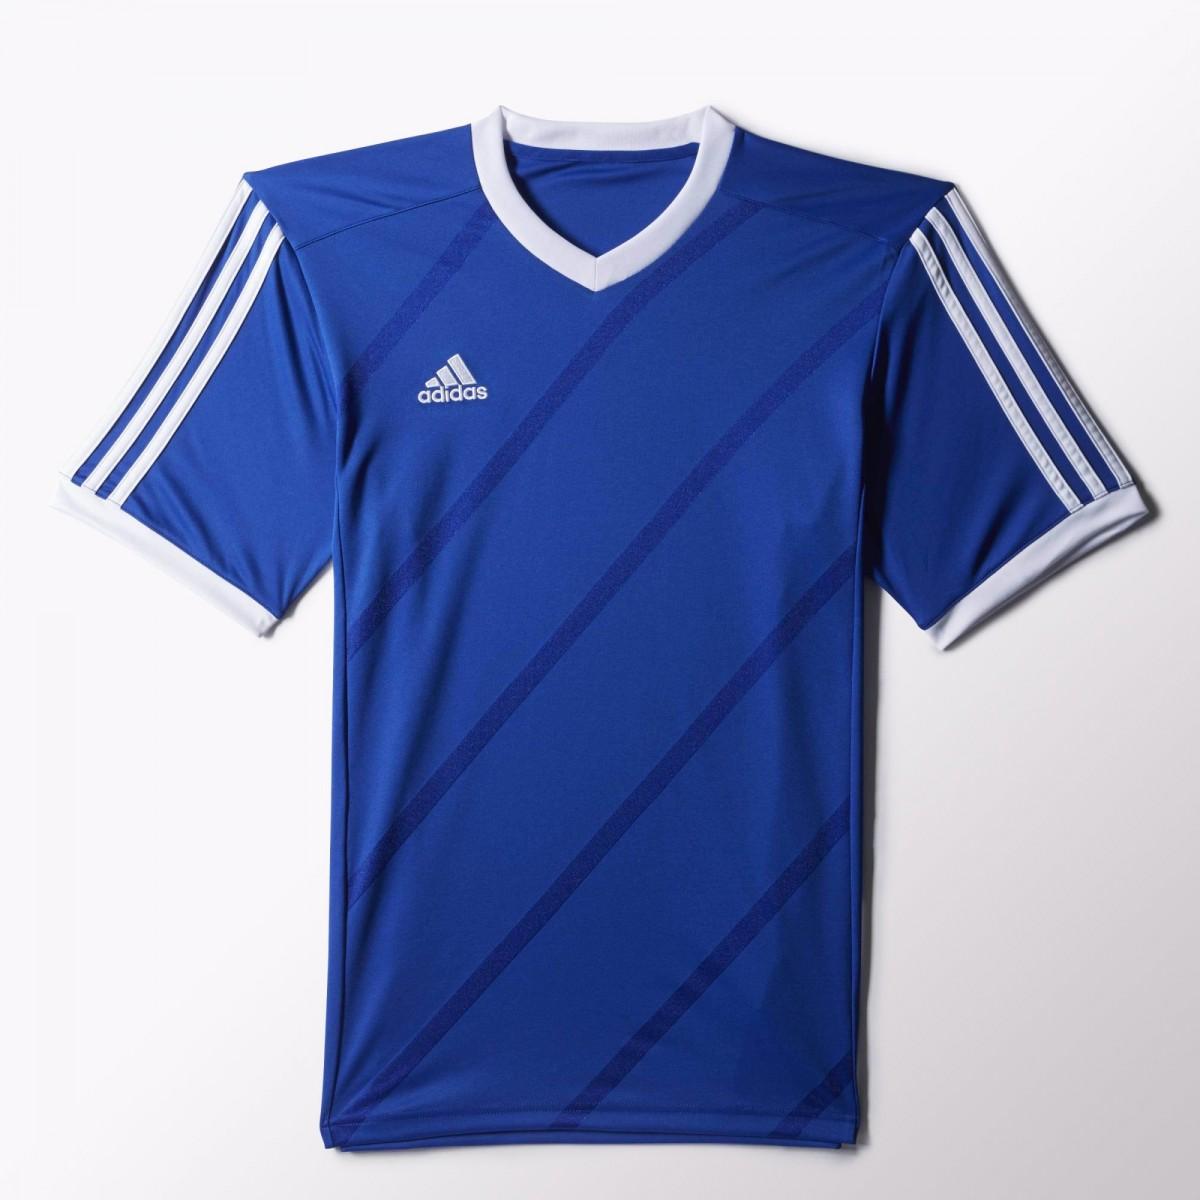 ad9fe7ba51 Bizz Store - Camiseta Masculina Adidas Tabela 14 Futebol Azul